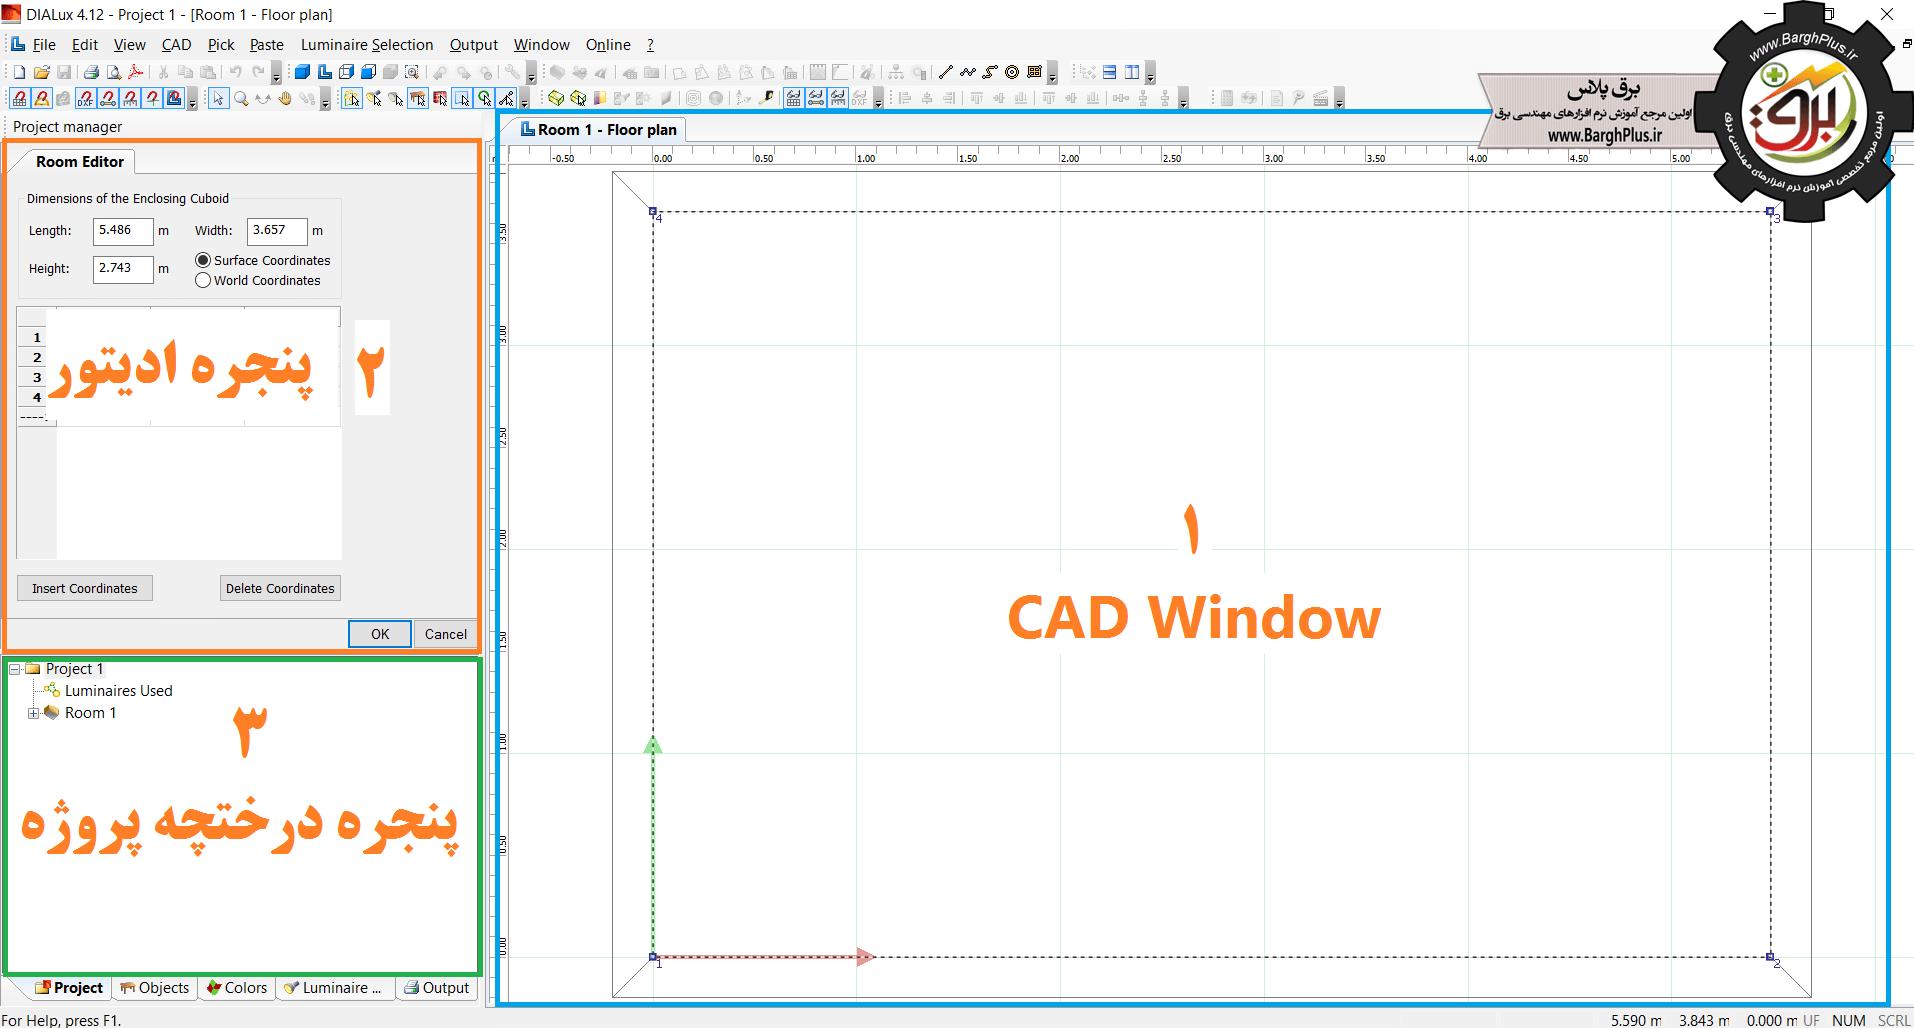 cad window - room editor - درختچه پروژه در نرم افزار دیالوکس